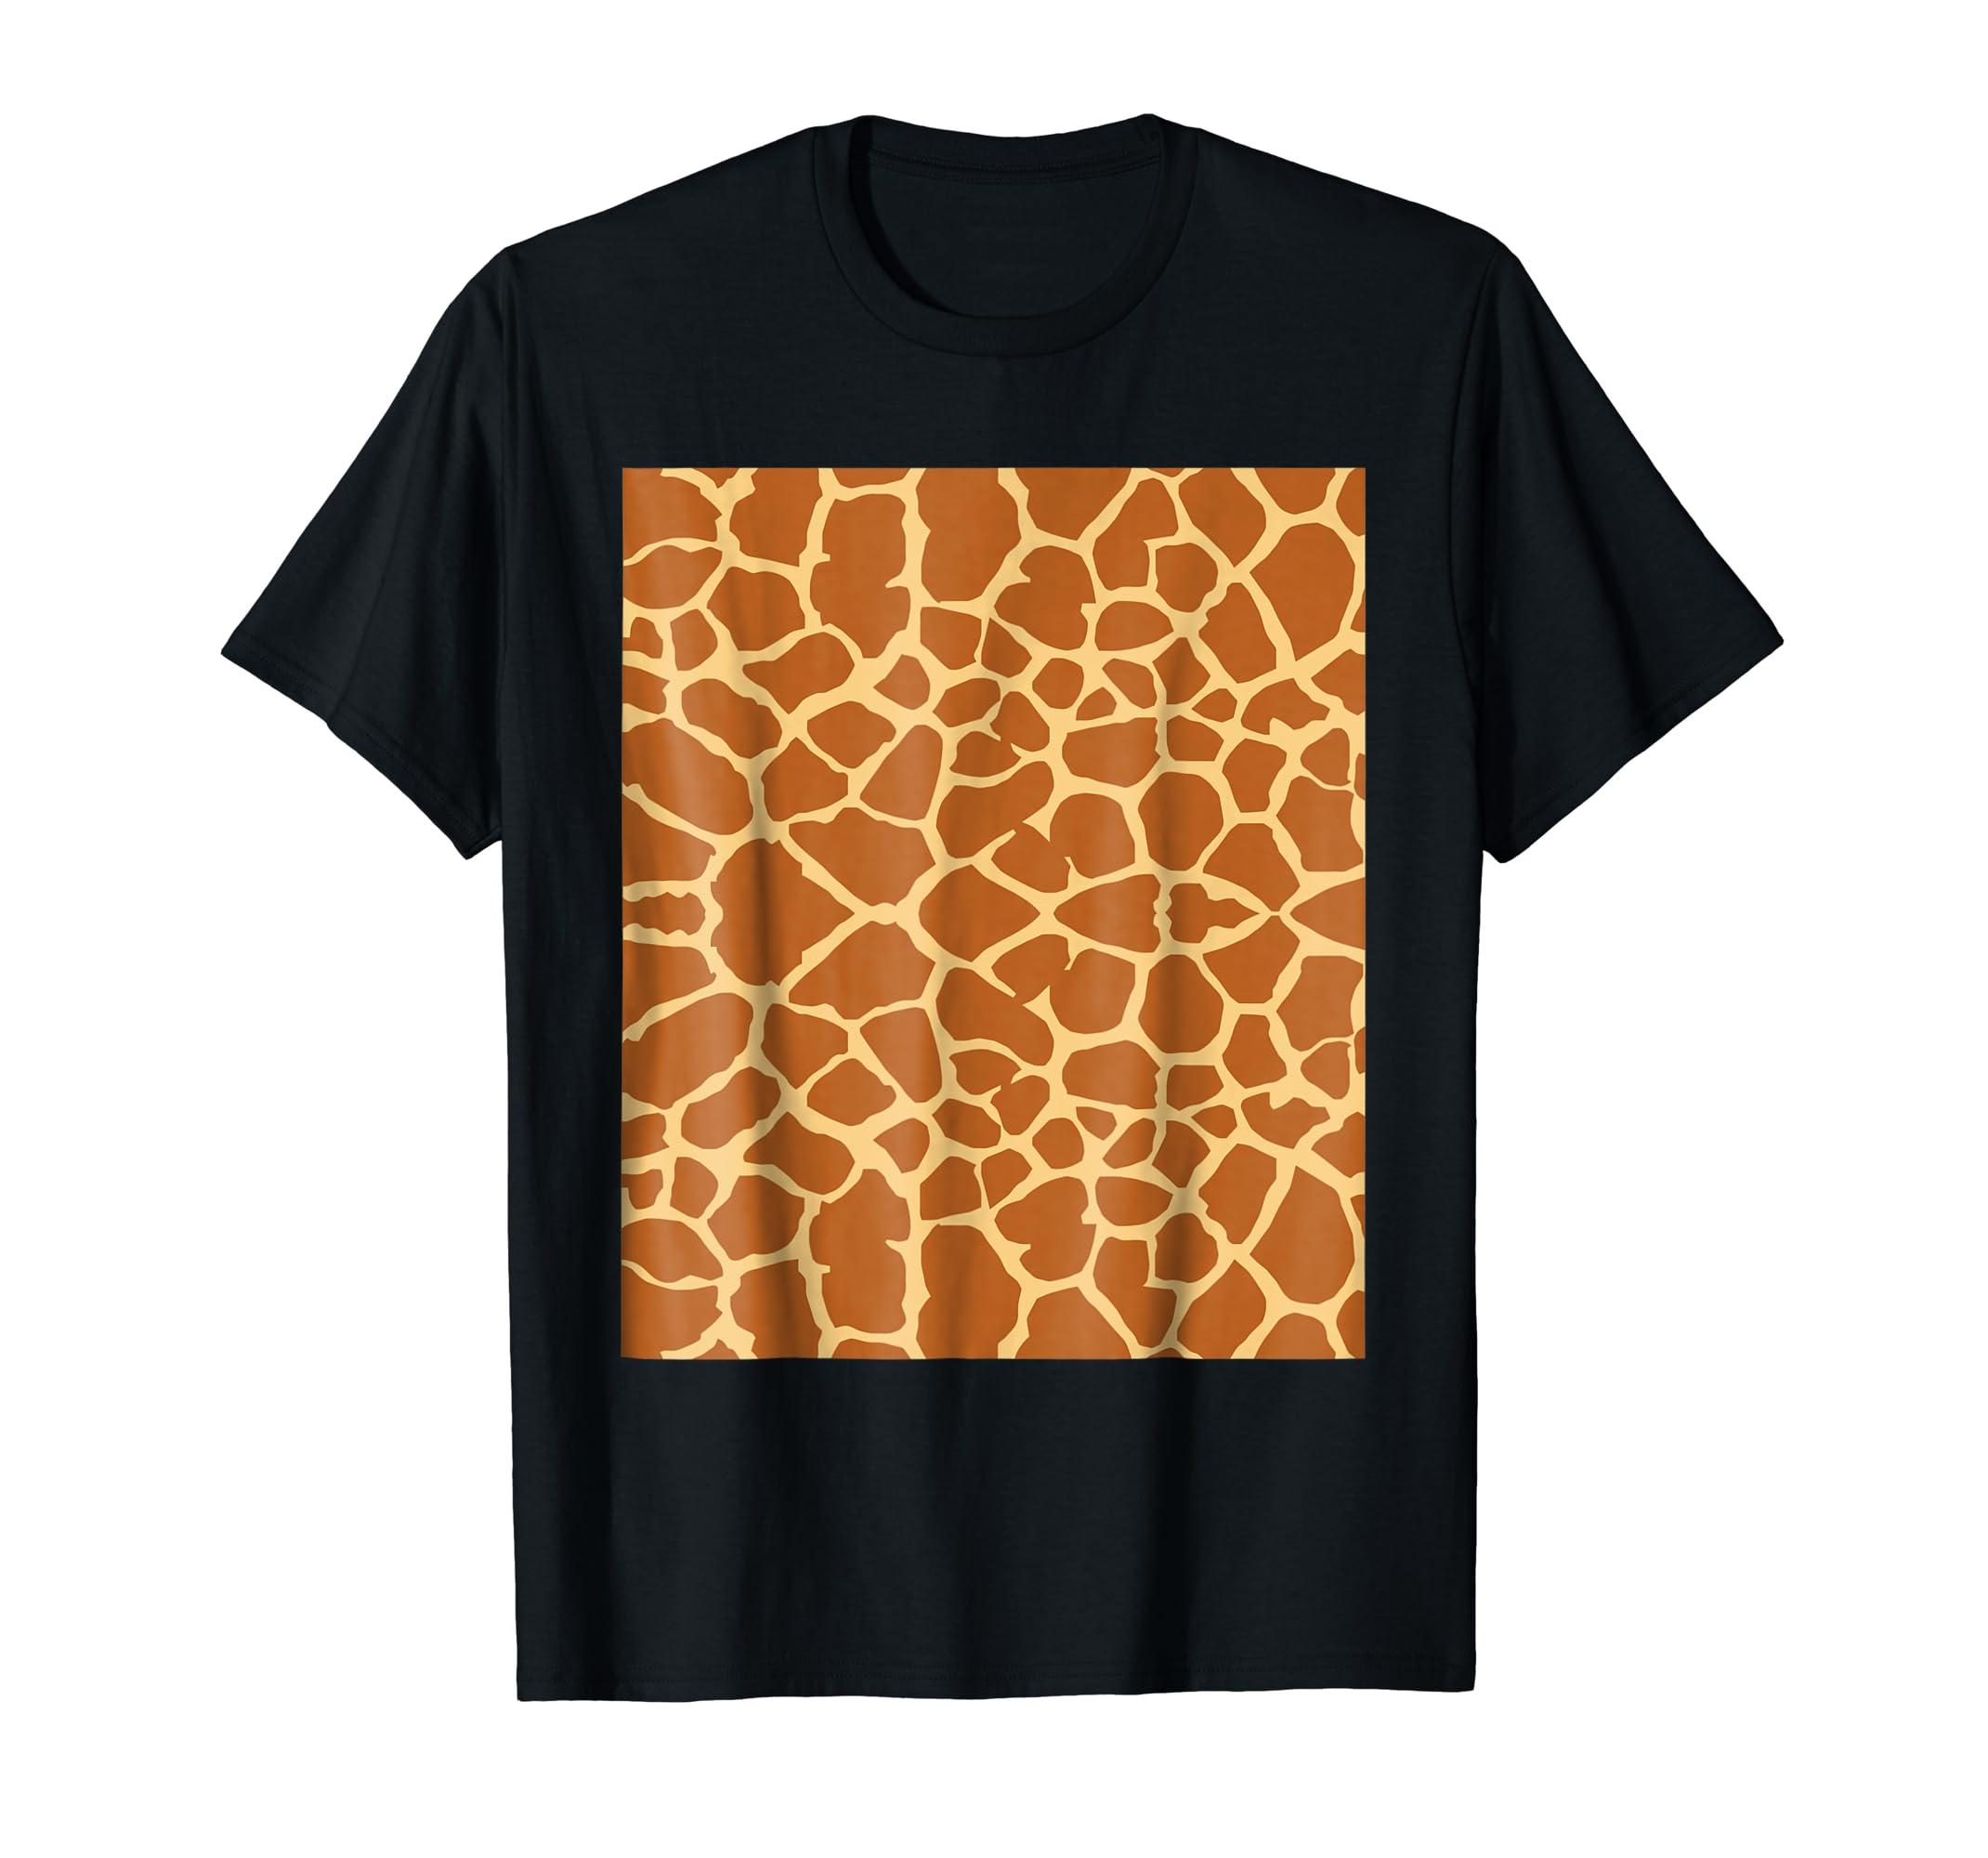 a9ffa6bb Amazon.com: Giraffe Print T Shirt Giraffe Pattern Costume Gift Shirt:  Clothing